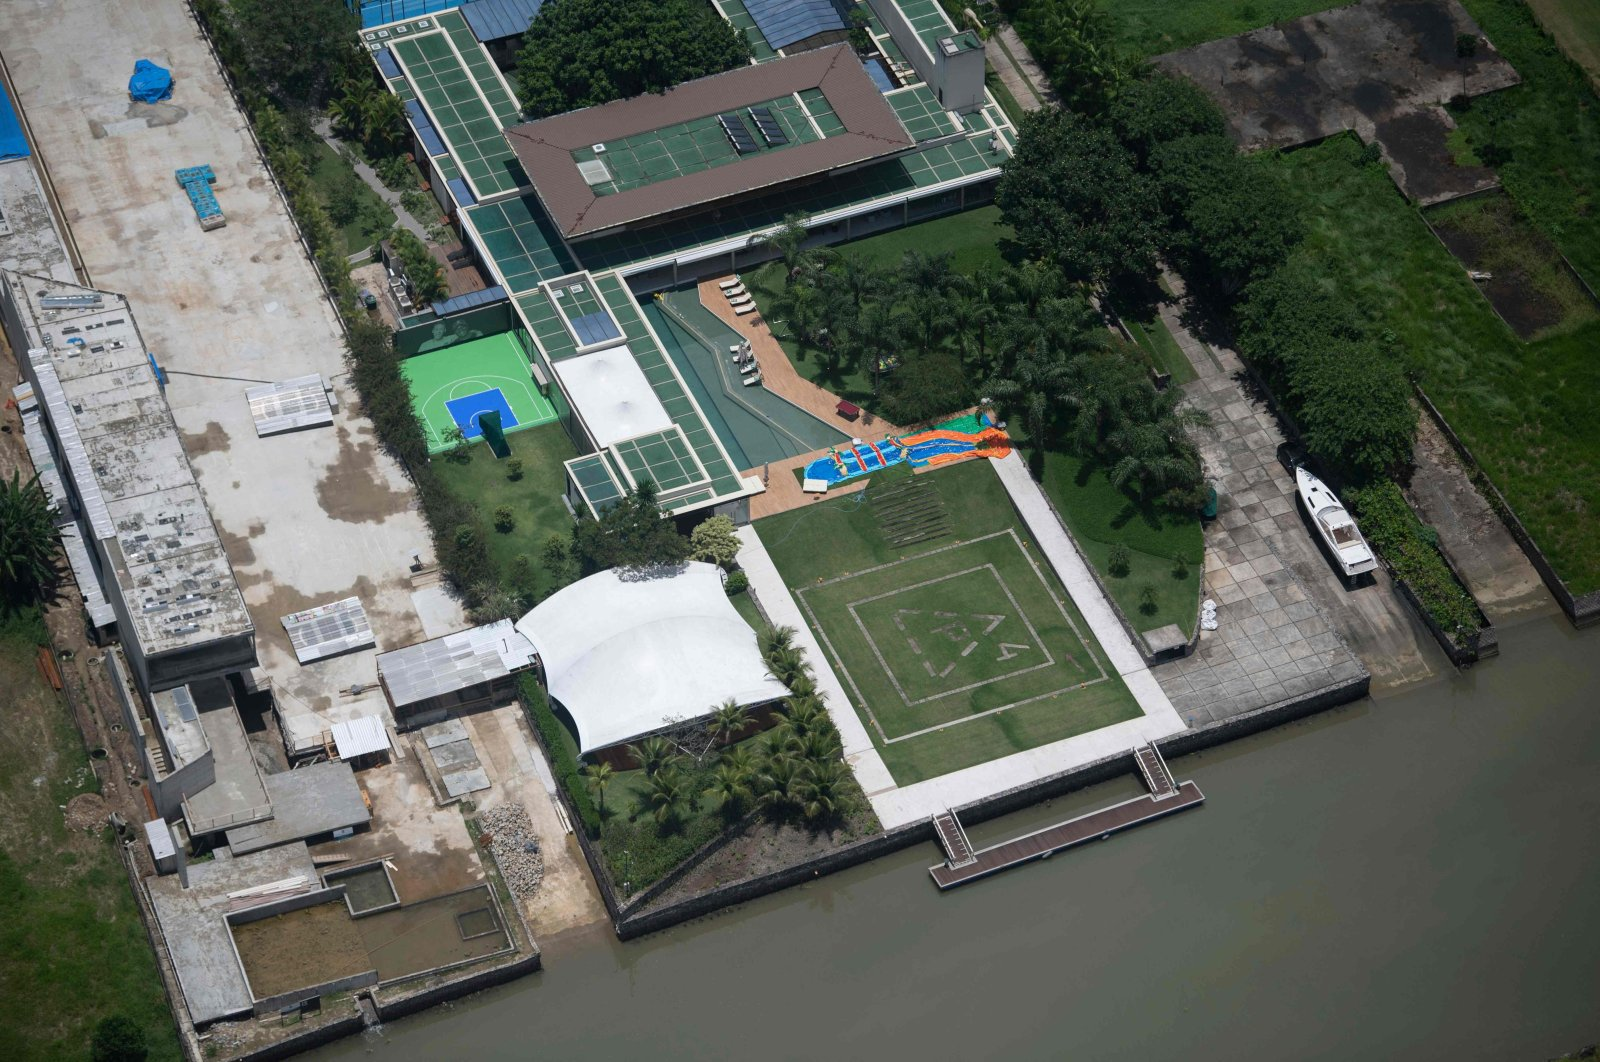 An aerial view of the luxury beachside mansion of Brazilian footballer Neymar in Mangaratiba, near Rio de Janeiro, Brazil, Dec. 30, 2020. (AFP Photo)